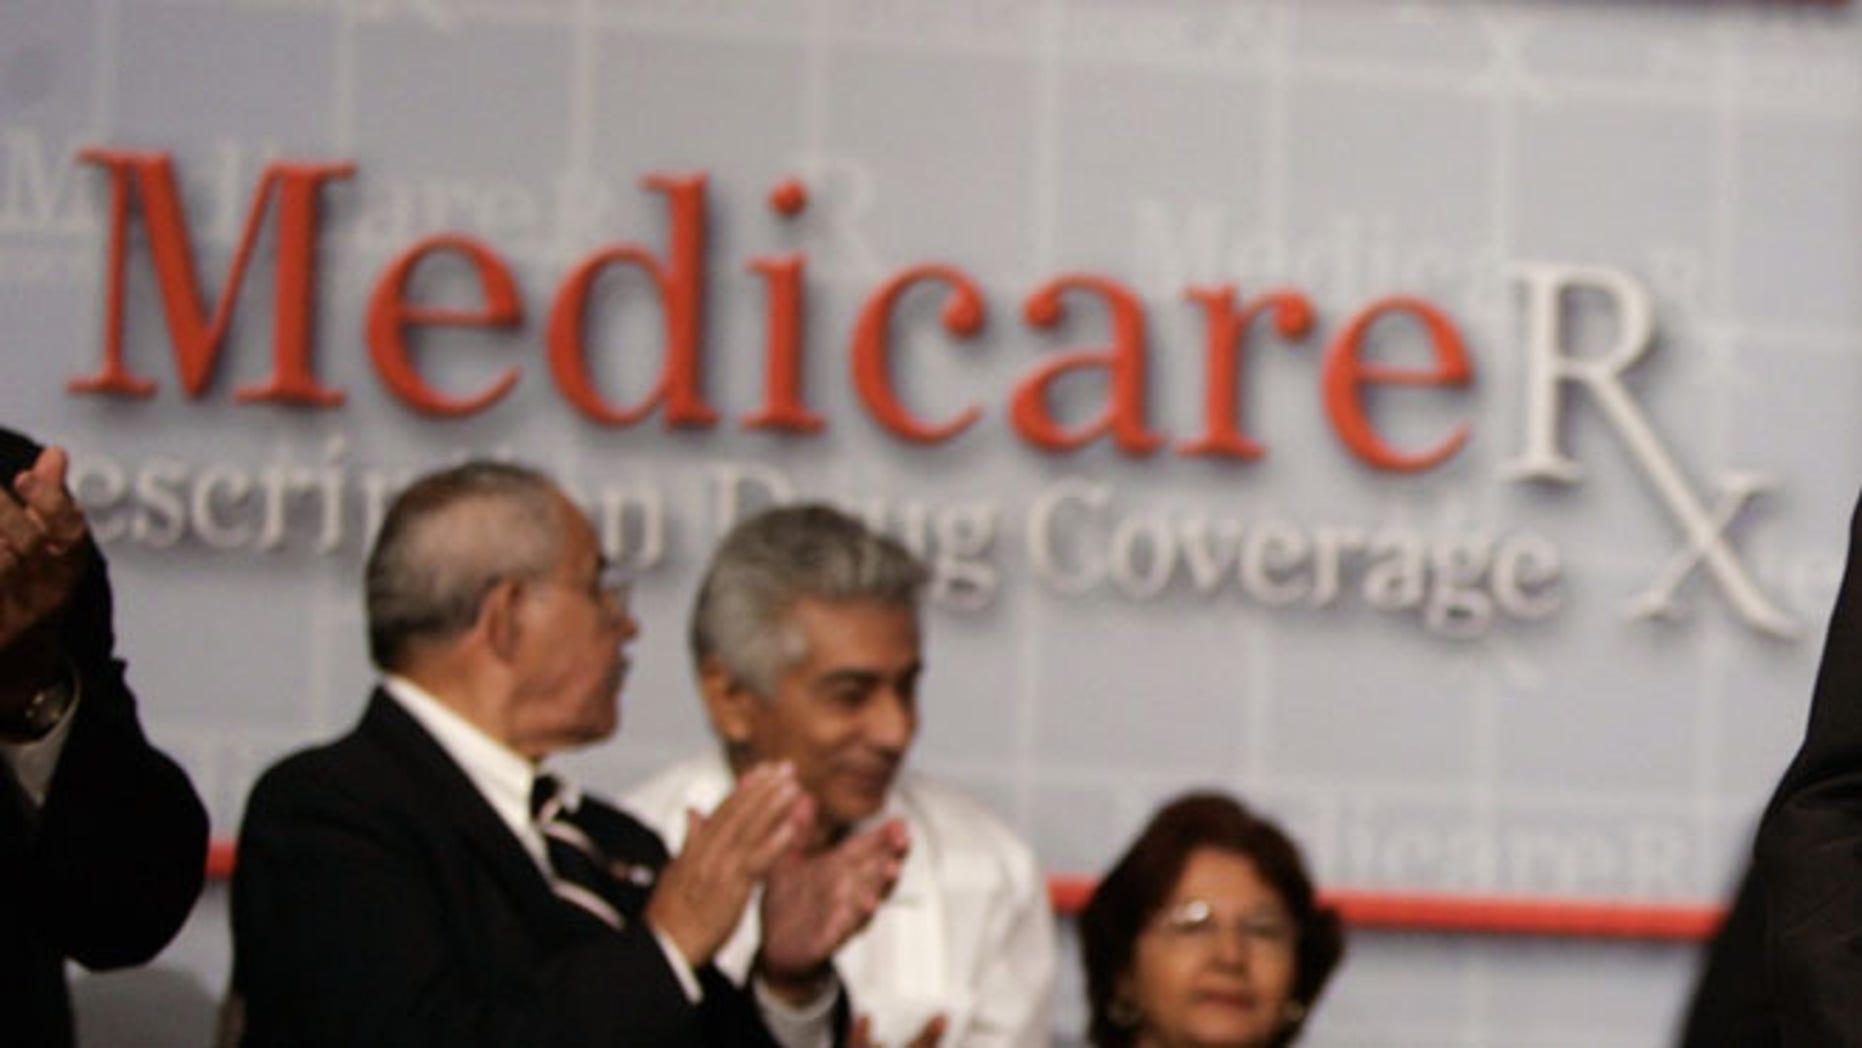 FILE: Attendees of a 2006 conversation on the Medicare Prescription Drug Benefit at the Asociacion Borinquena de Florida Central in Orlando, Fla.